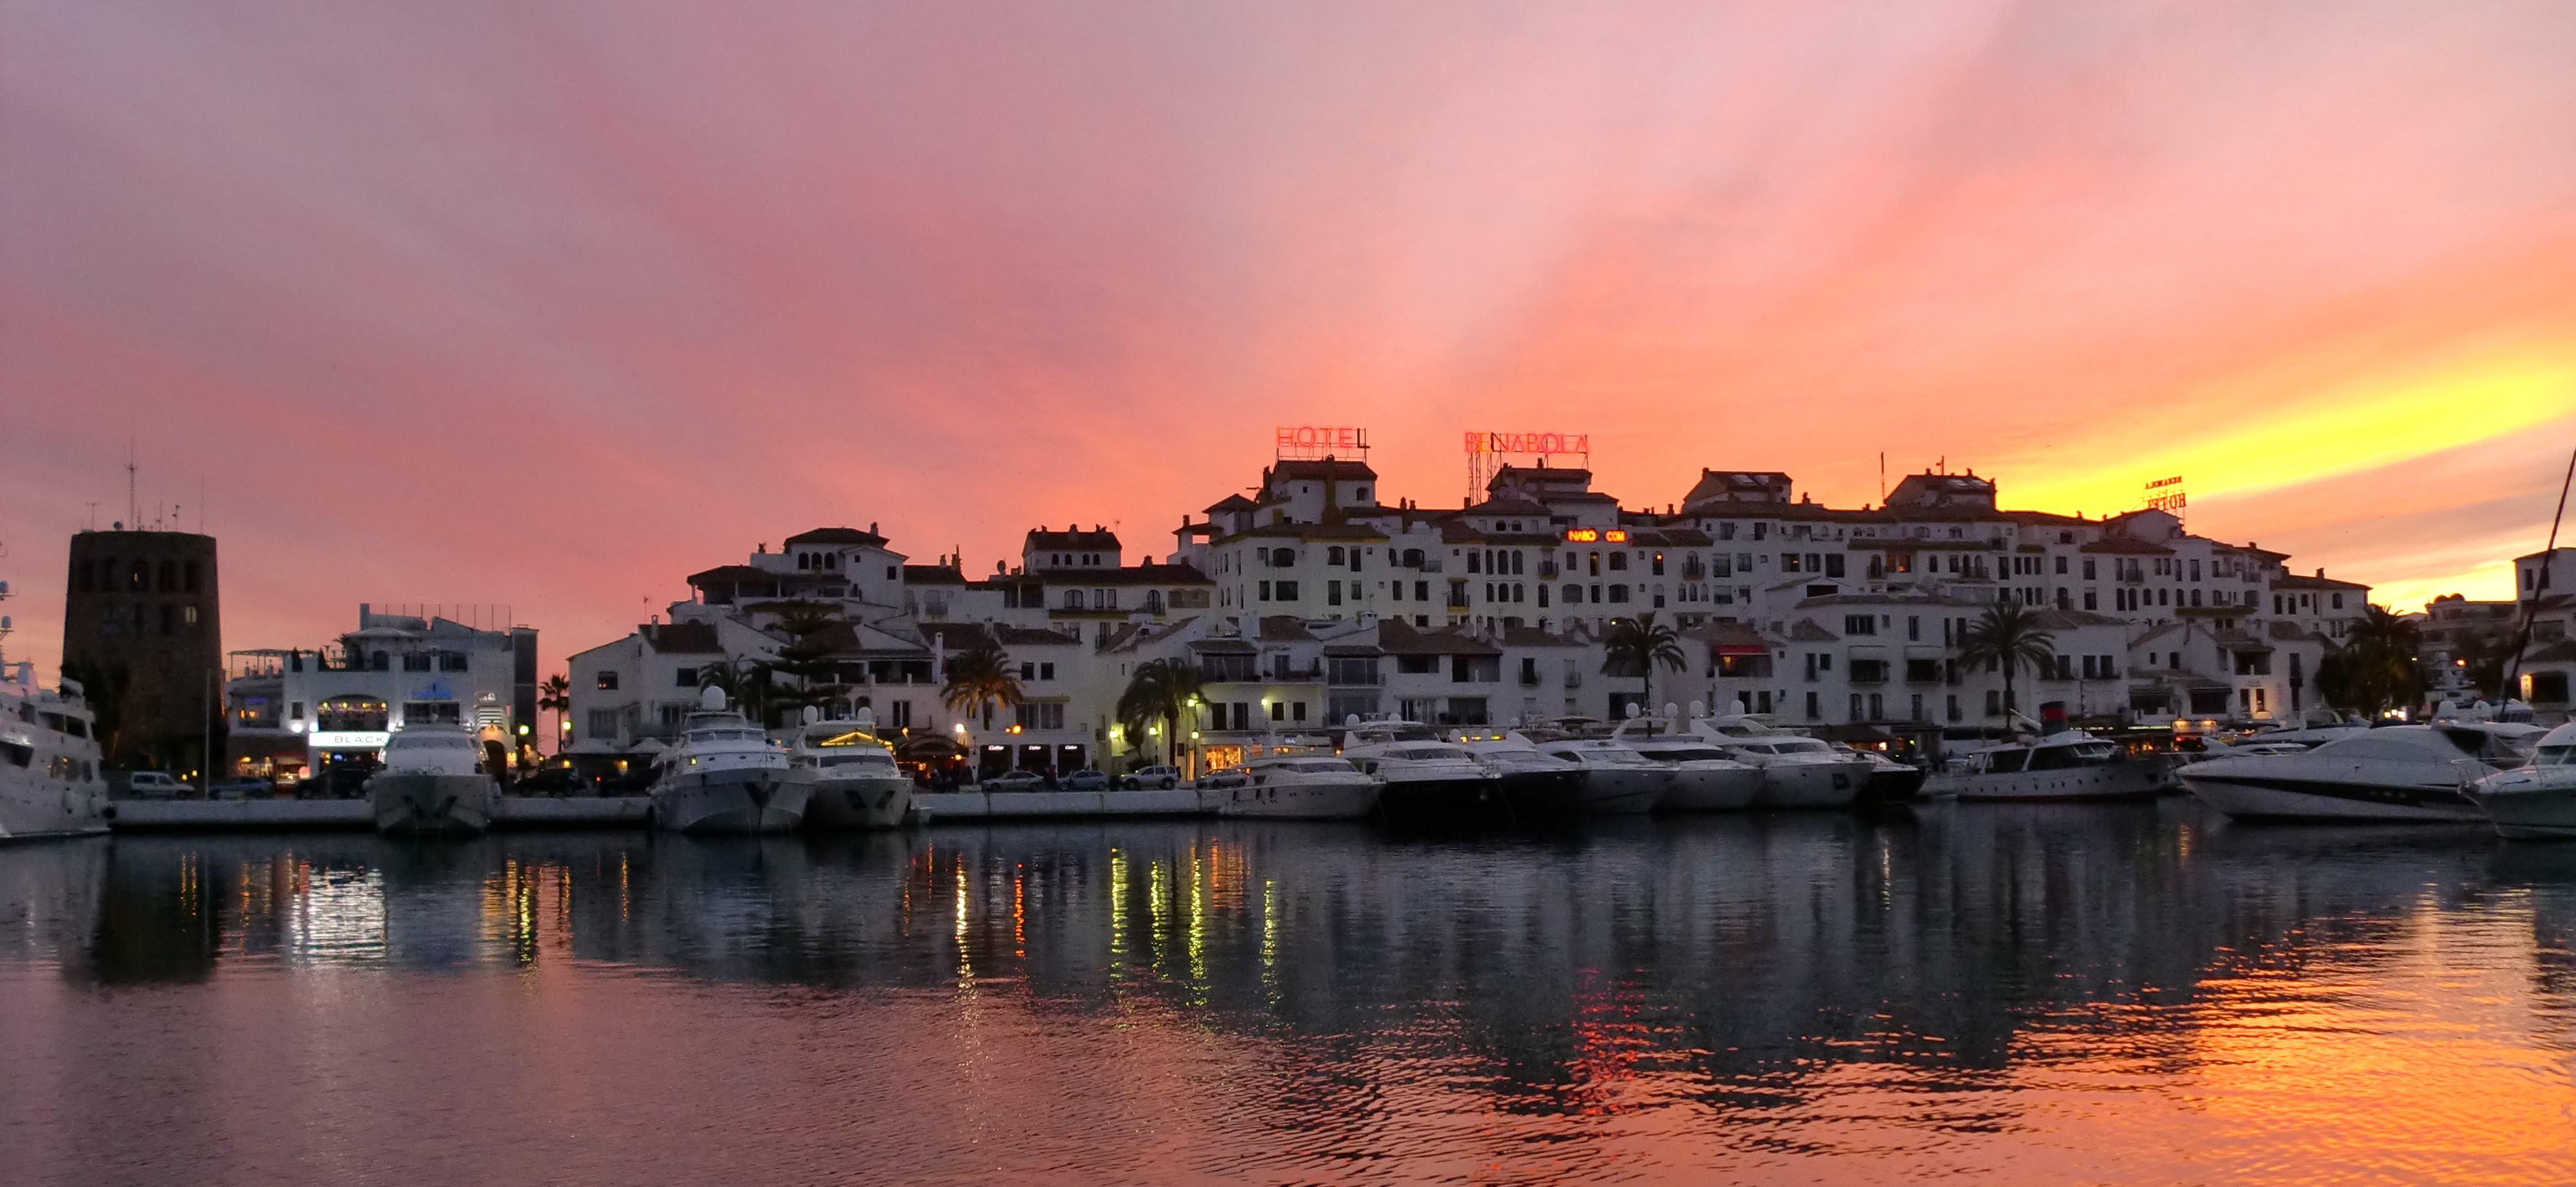 Puerto banus penthouse and boat for sale euros - Puerto banus marbella ...